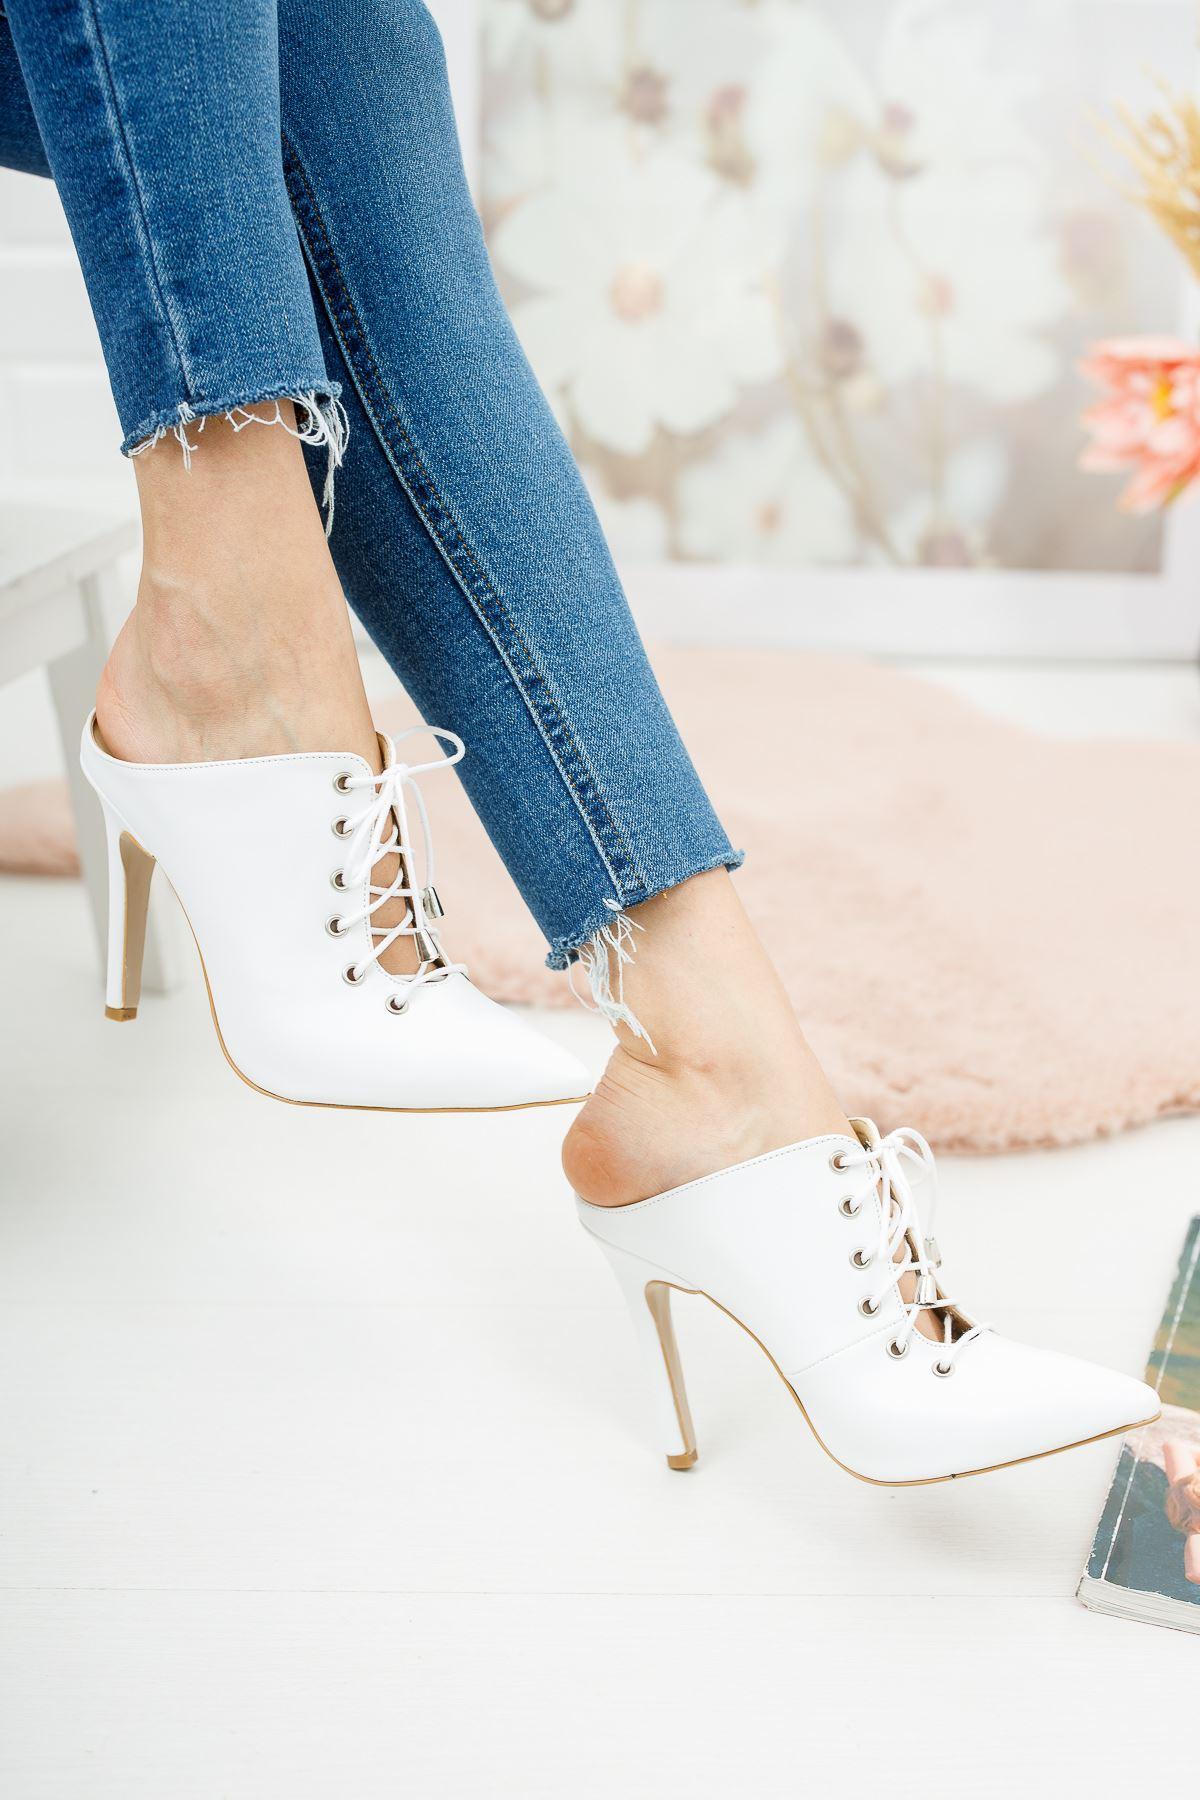 Marina Beyaz Cilt Topuklu Ayakkabı Stiletto